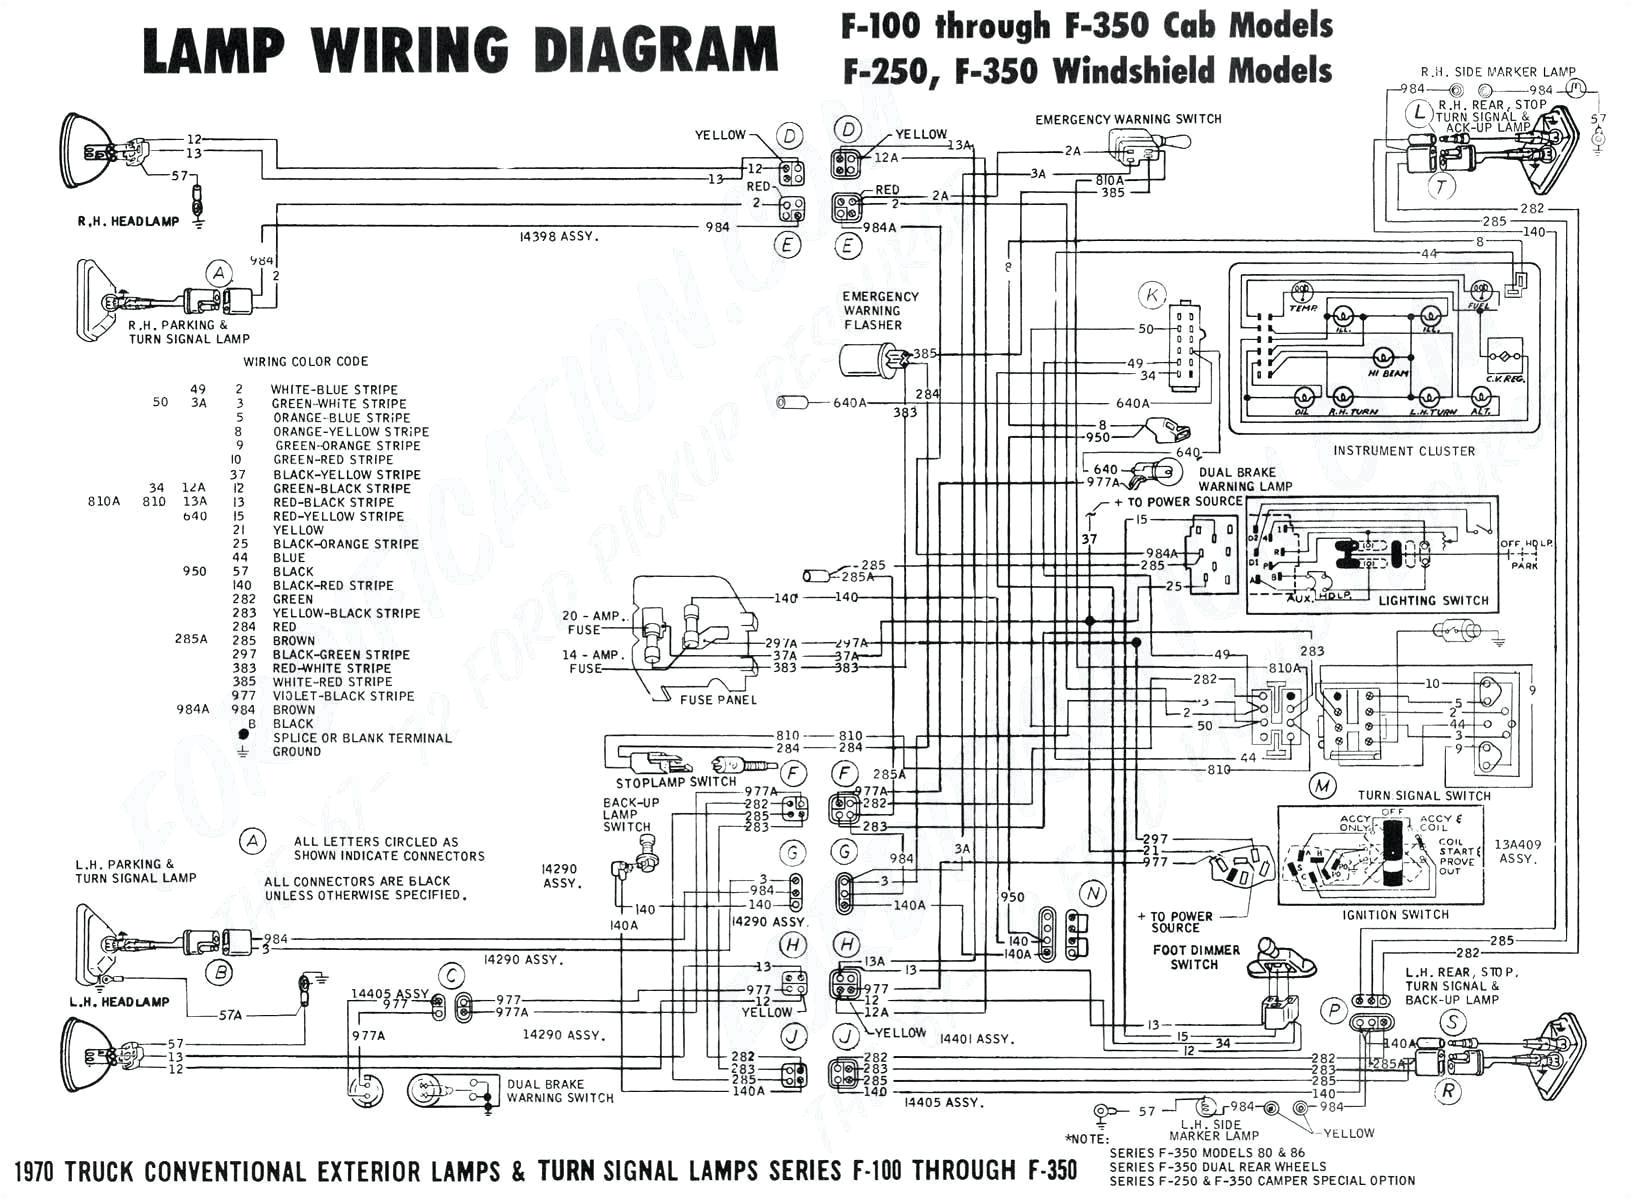 toyota auris wiring diagram fresh honda cb750 wiring diagram electrical circuit wiring diagram honda jpg